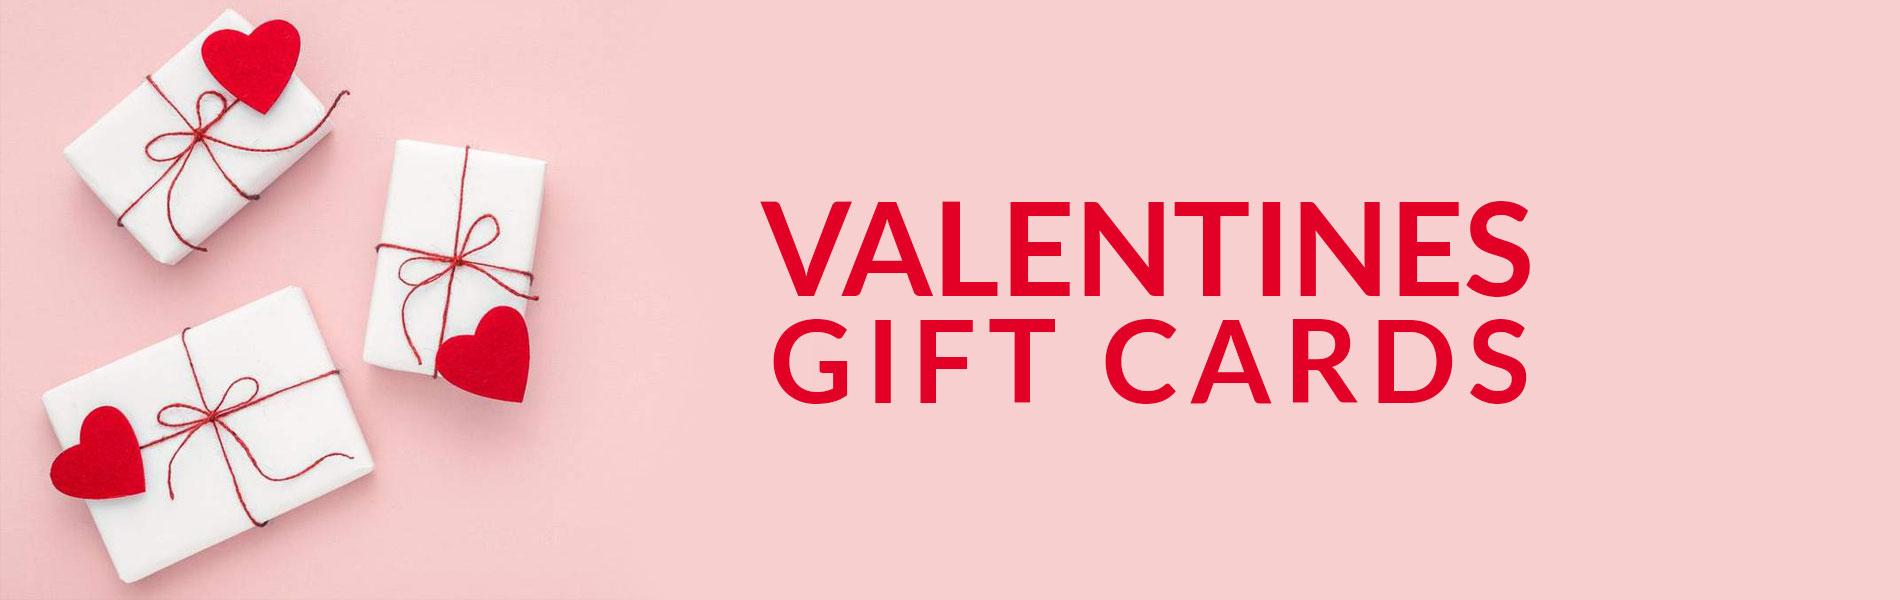 valentines-Gift-Cards-banner